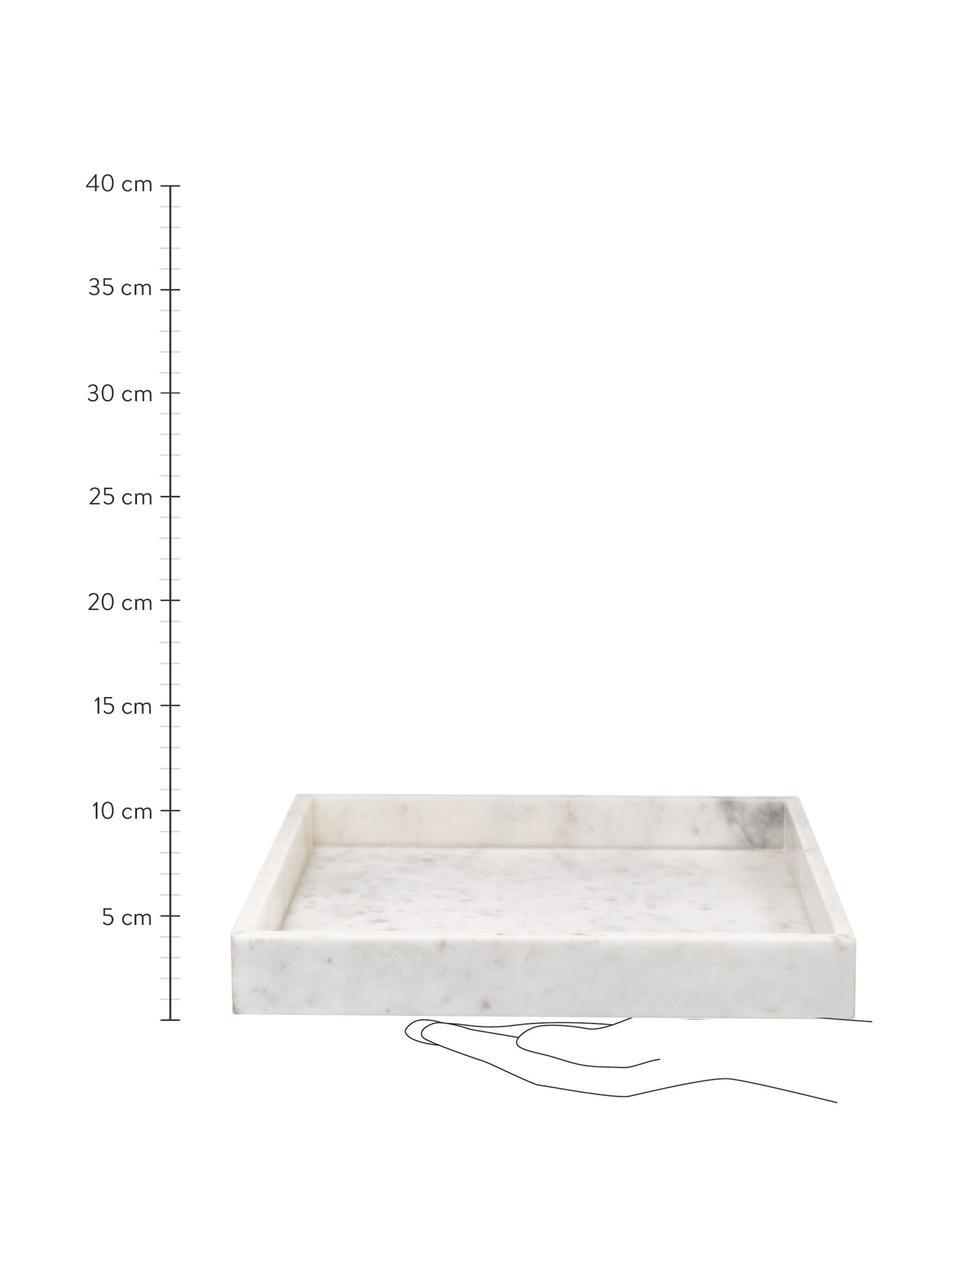 Deko-Marmor-Tablett Sienna in Weiß, Marmor, Weiß, 30 x 4 cm